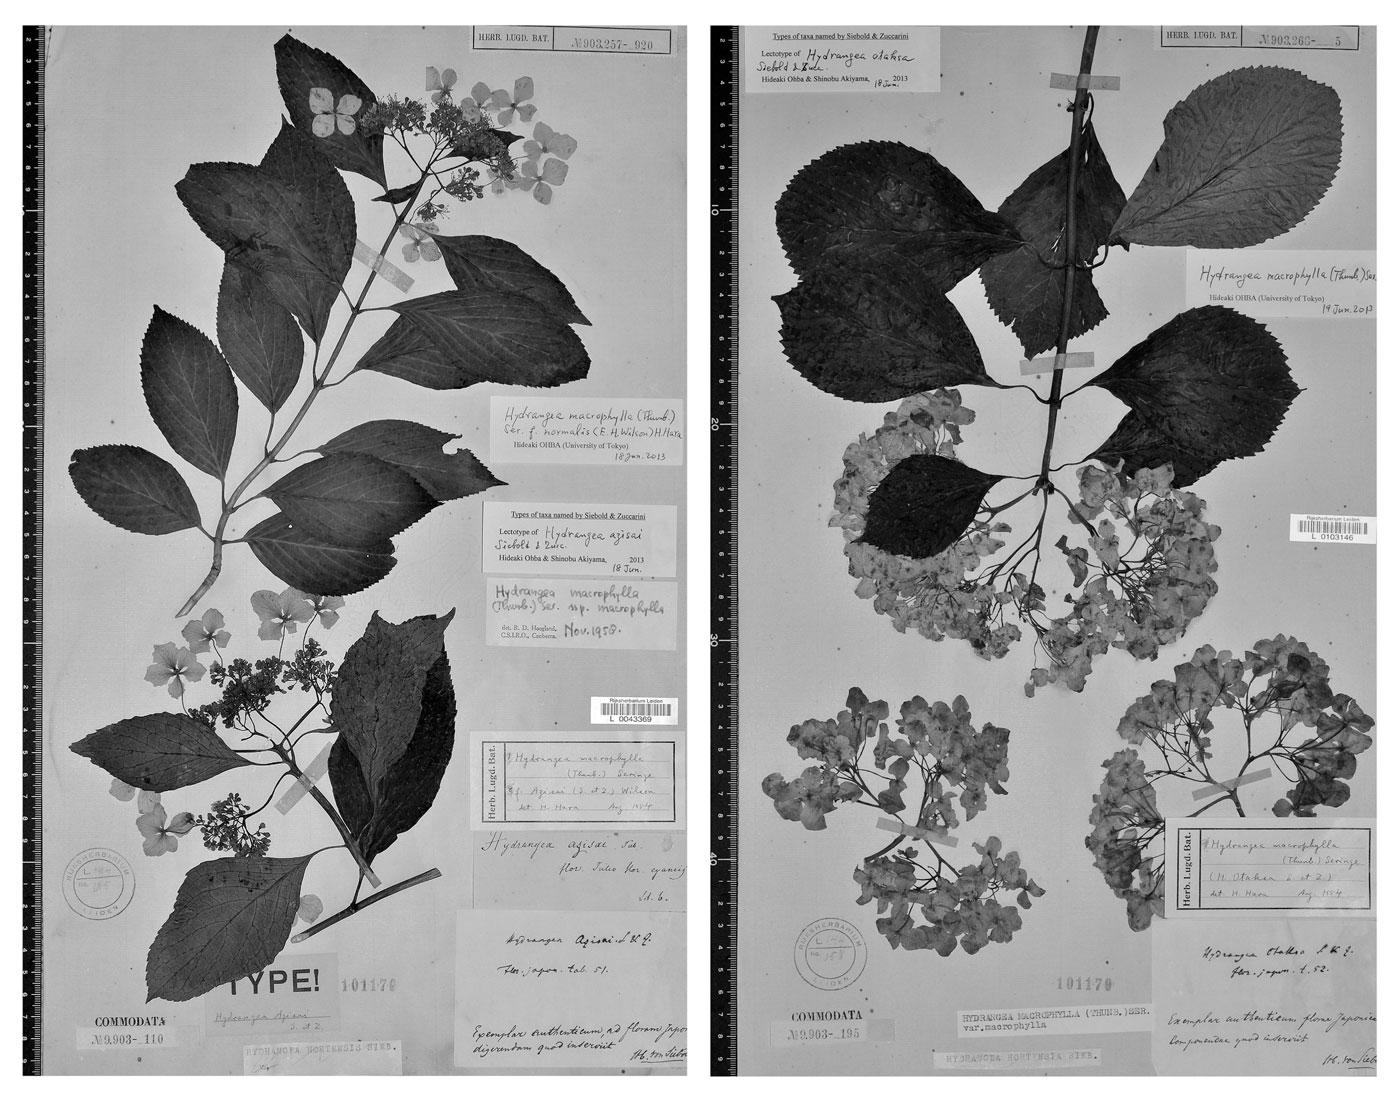 Lectotipi di <i>Hydrangea azisai</i> syn. <i>H. macrophylla</i> e <i>Hydrangea otaksa</i>.